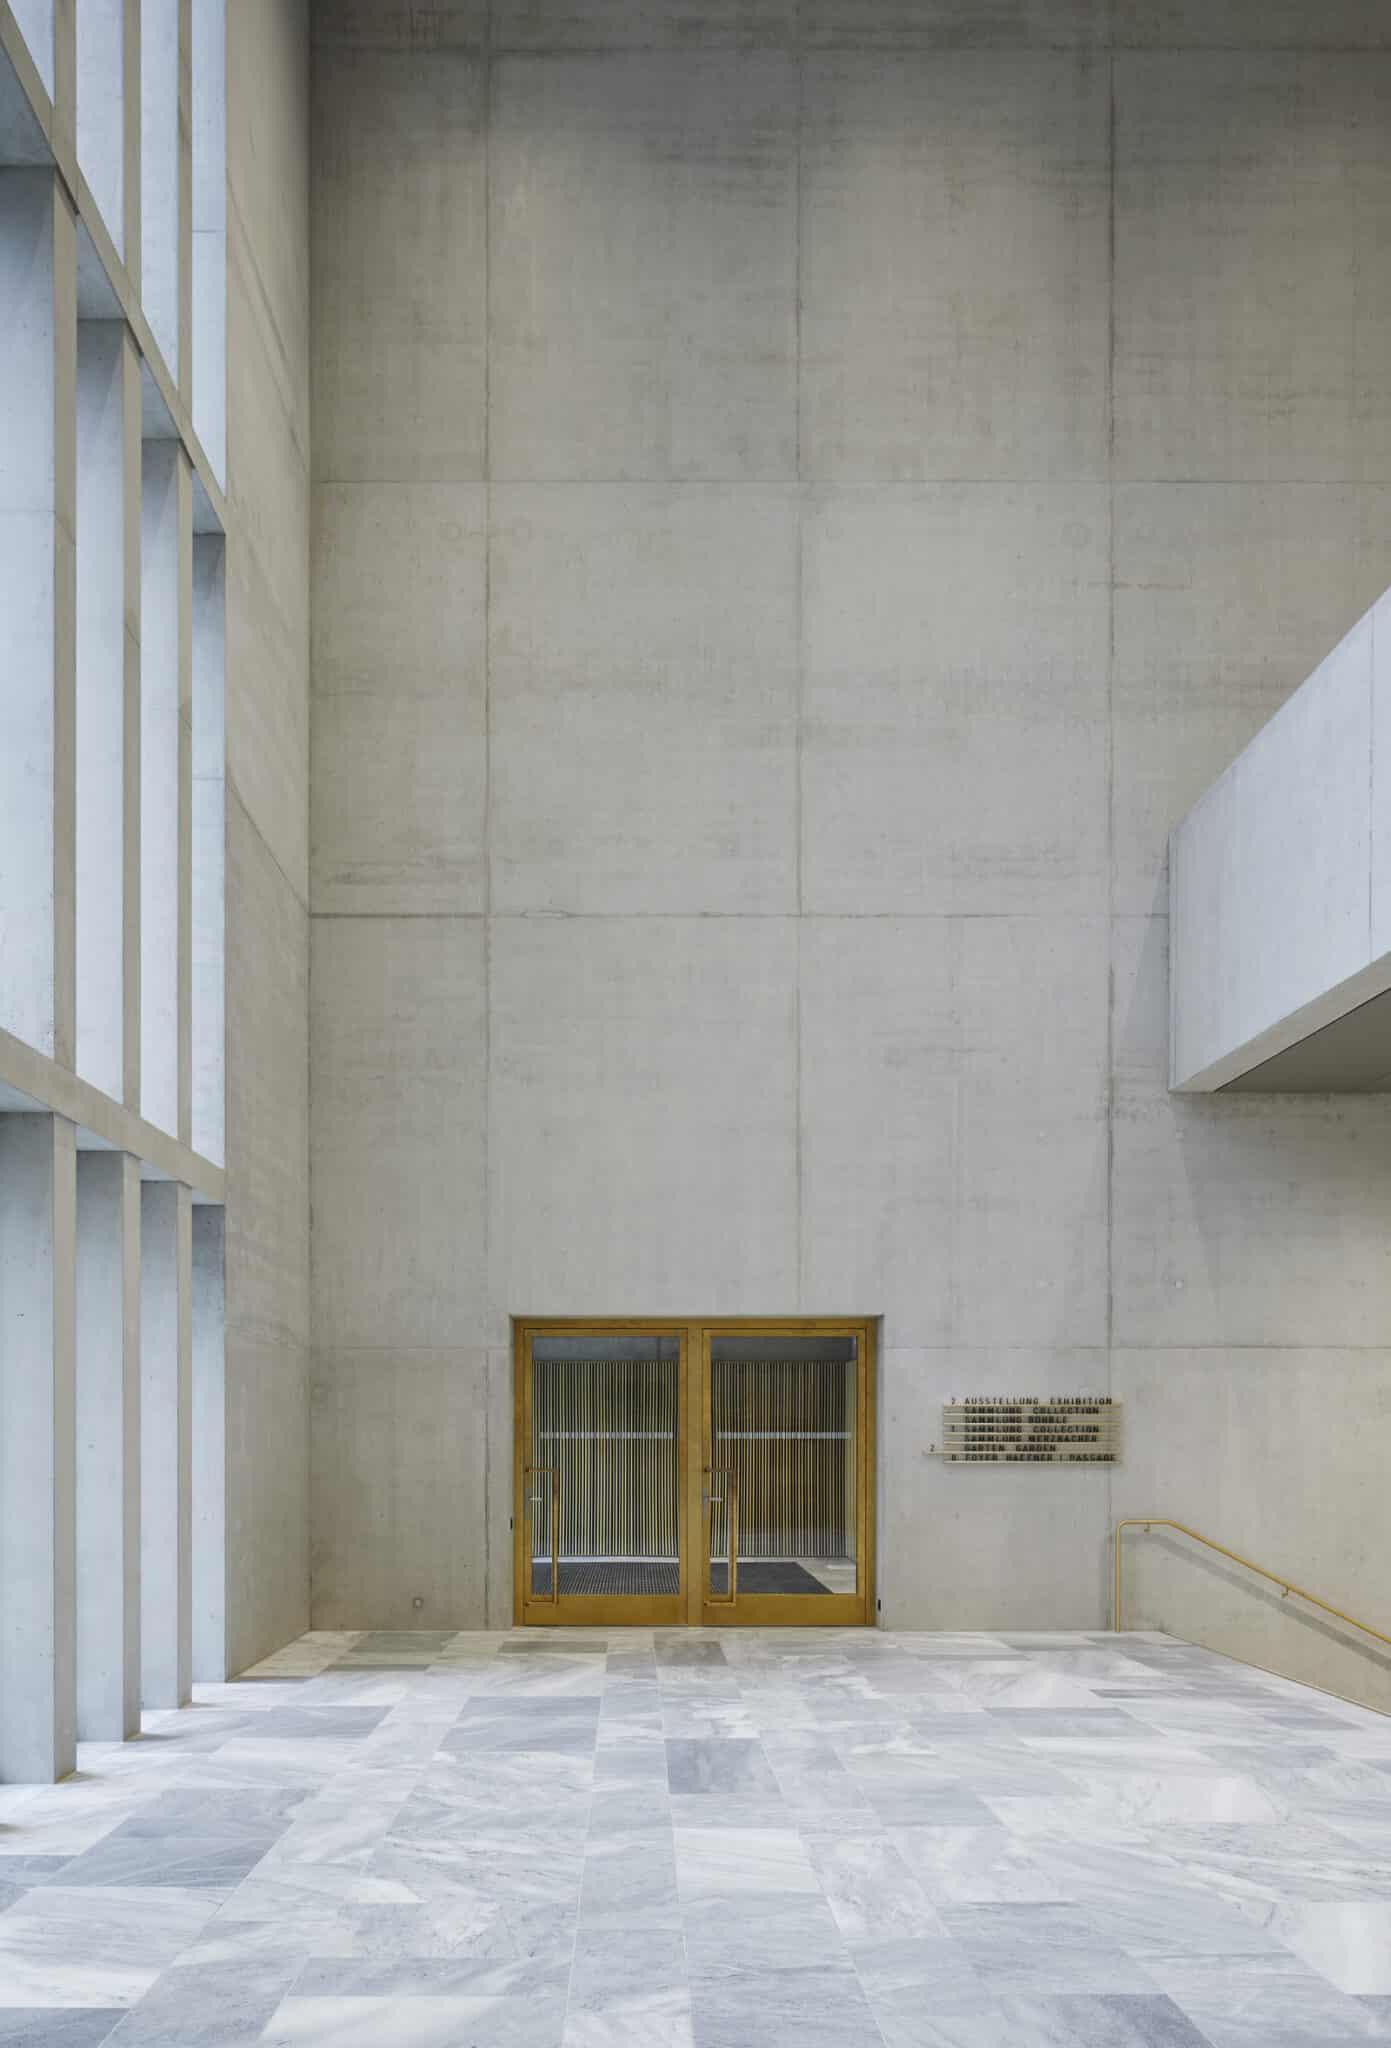 Kunsthaus Zürich  - 20210712 Chipperfield Kunsthaus 04.1 37